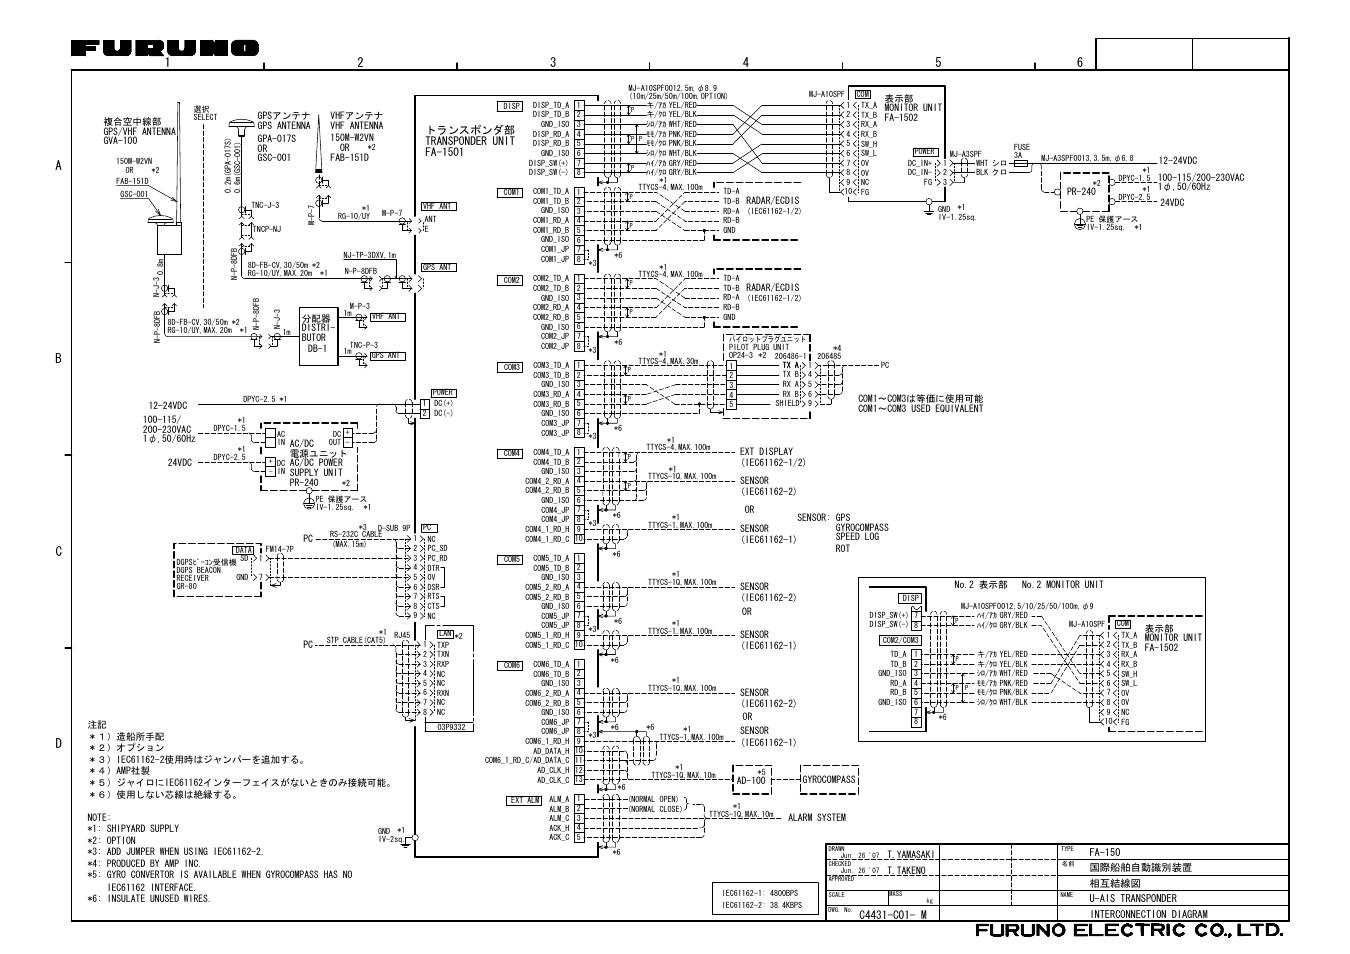 interconnection diagram cb d a transponder unit rh manualsdir com Example User Guide furuno fa-150 user manual